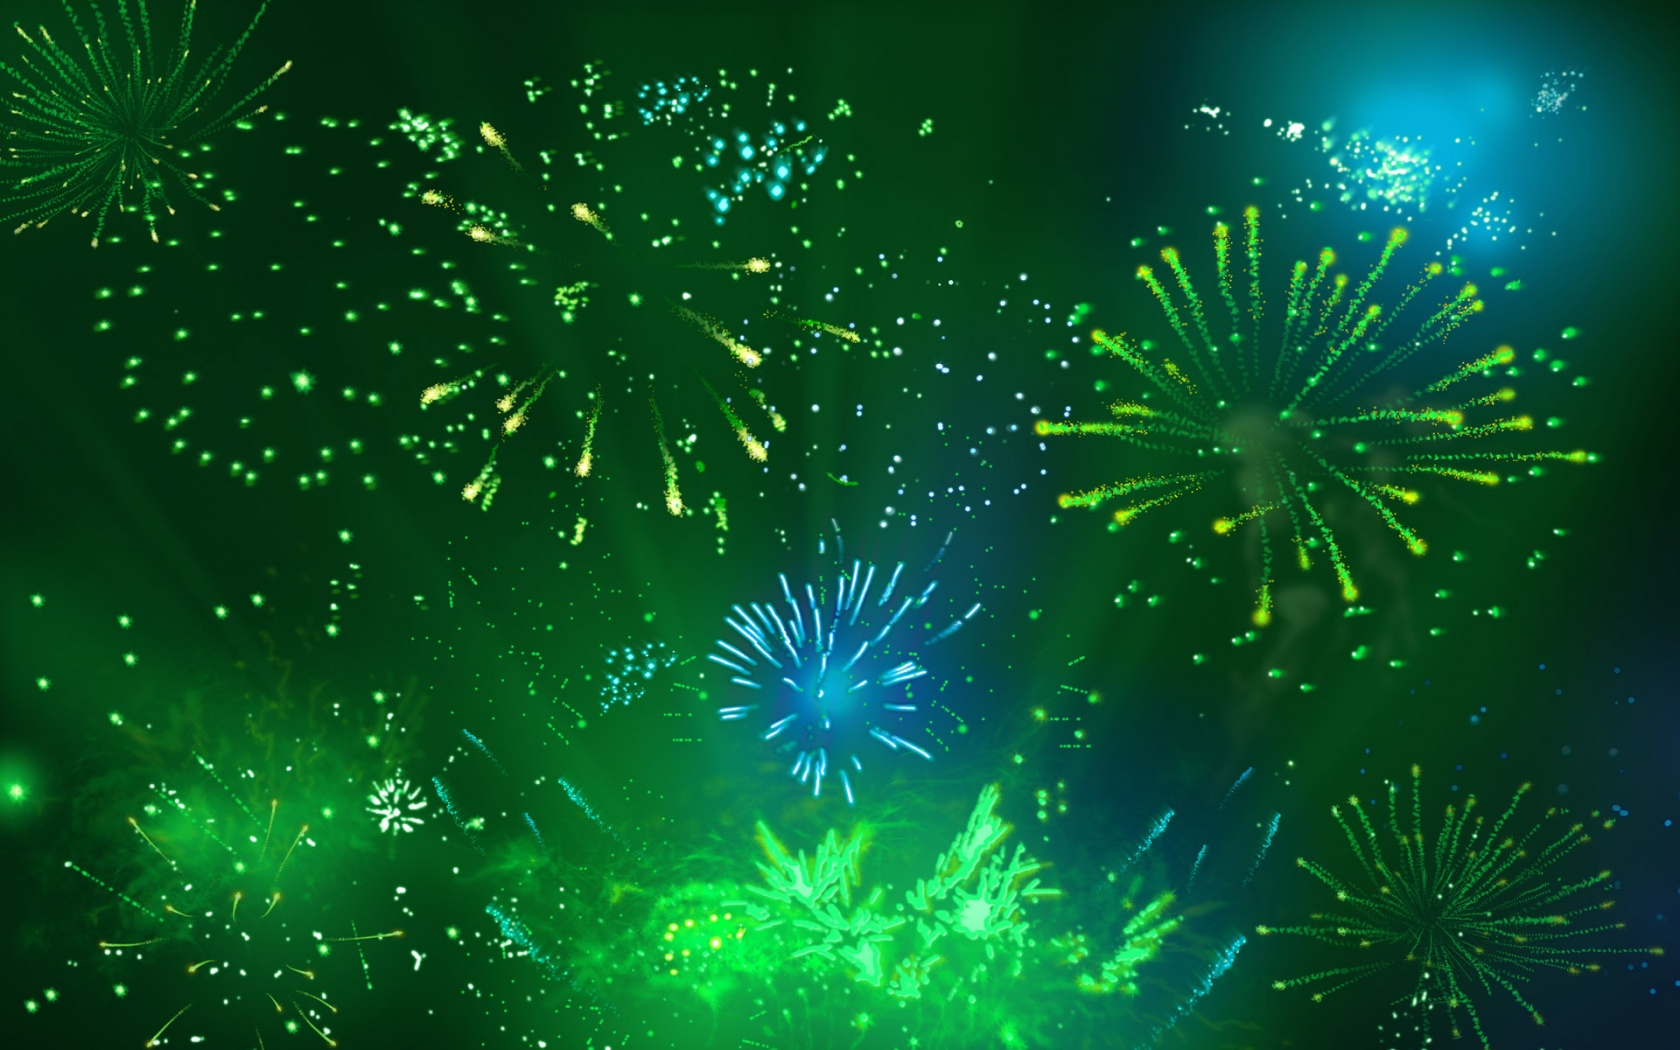 Wallpapers Blue Green Fireworks Myspace Backgrounds Blue Green 1680x1050